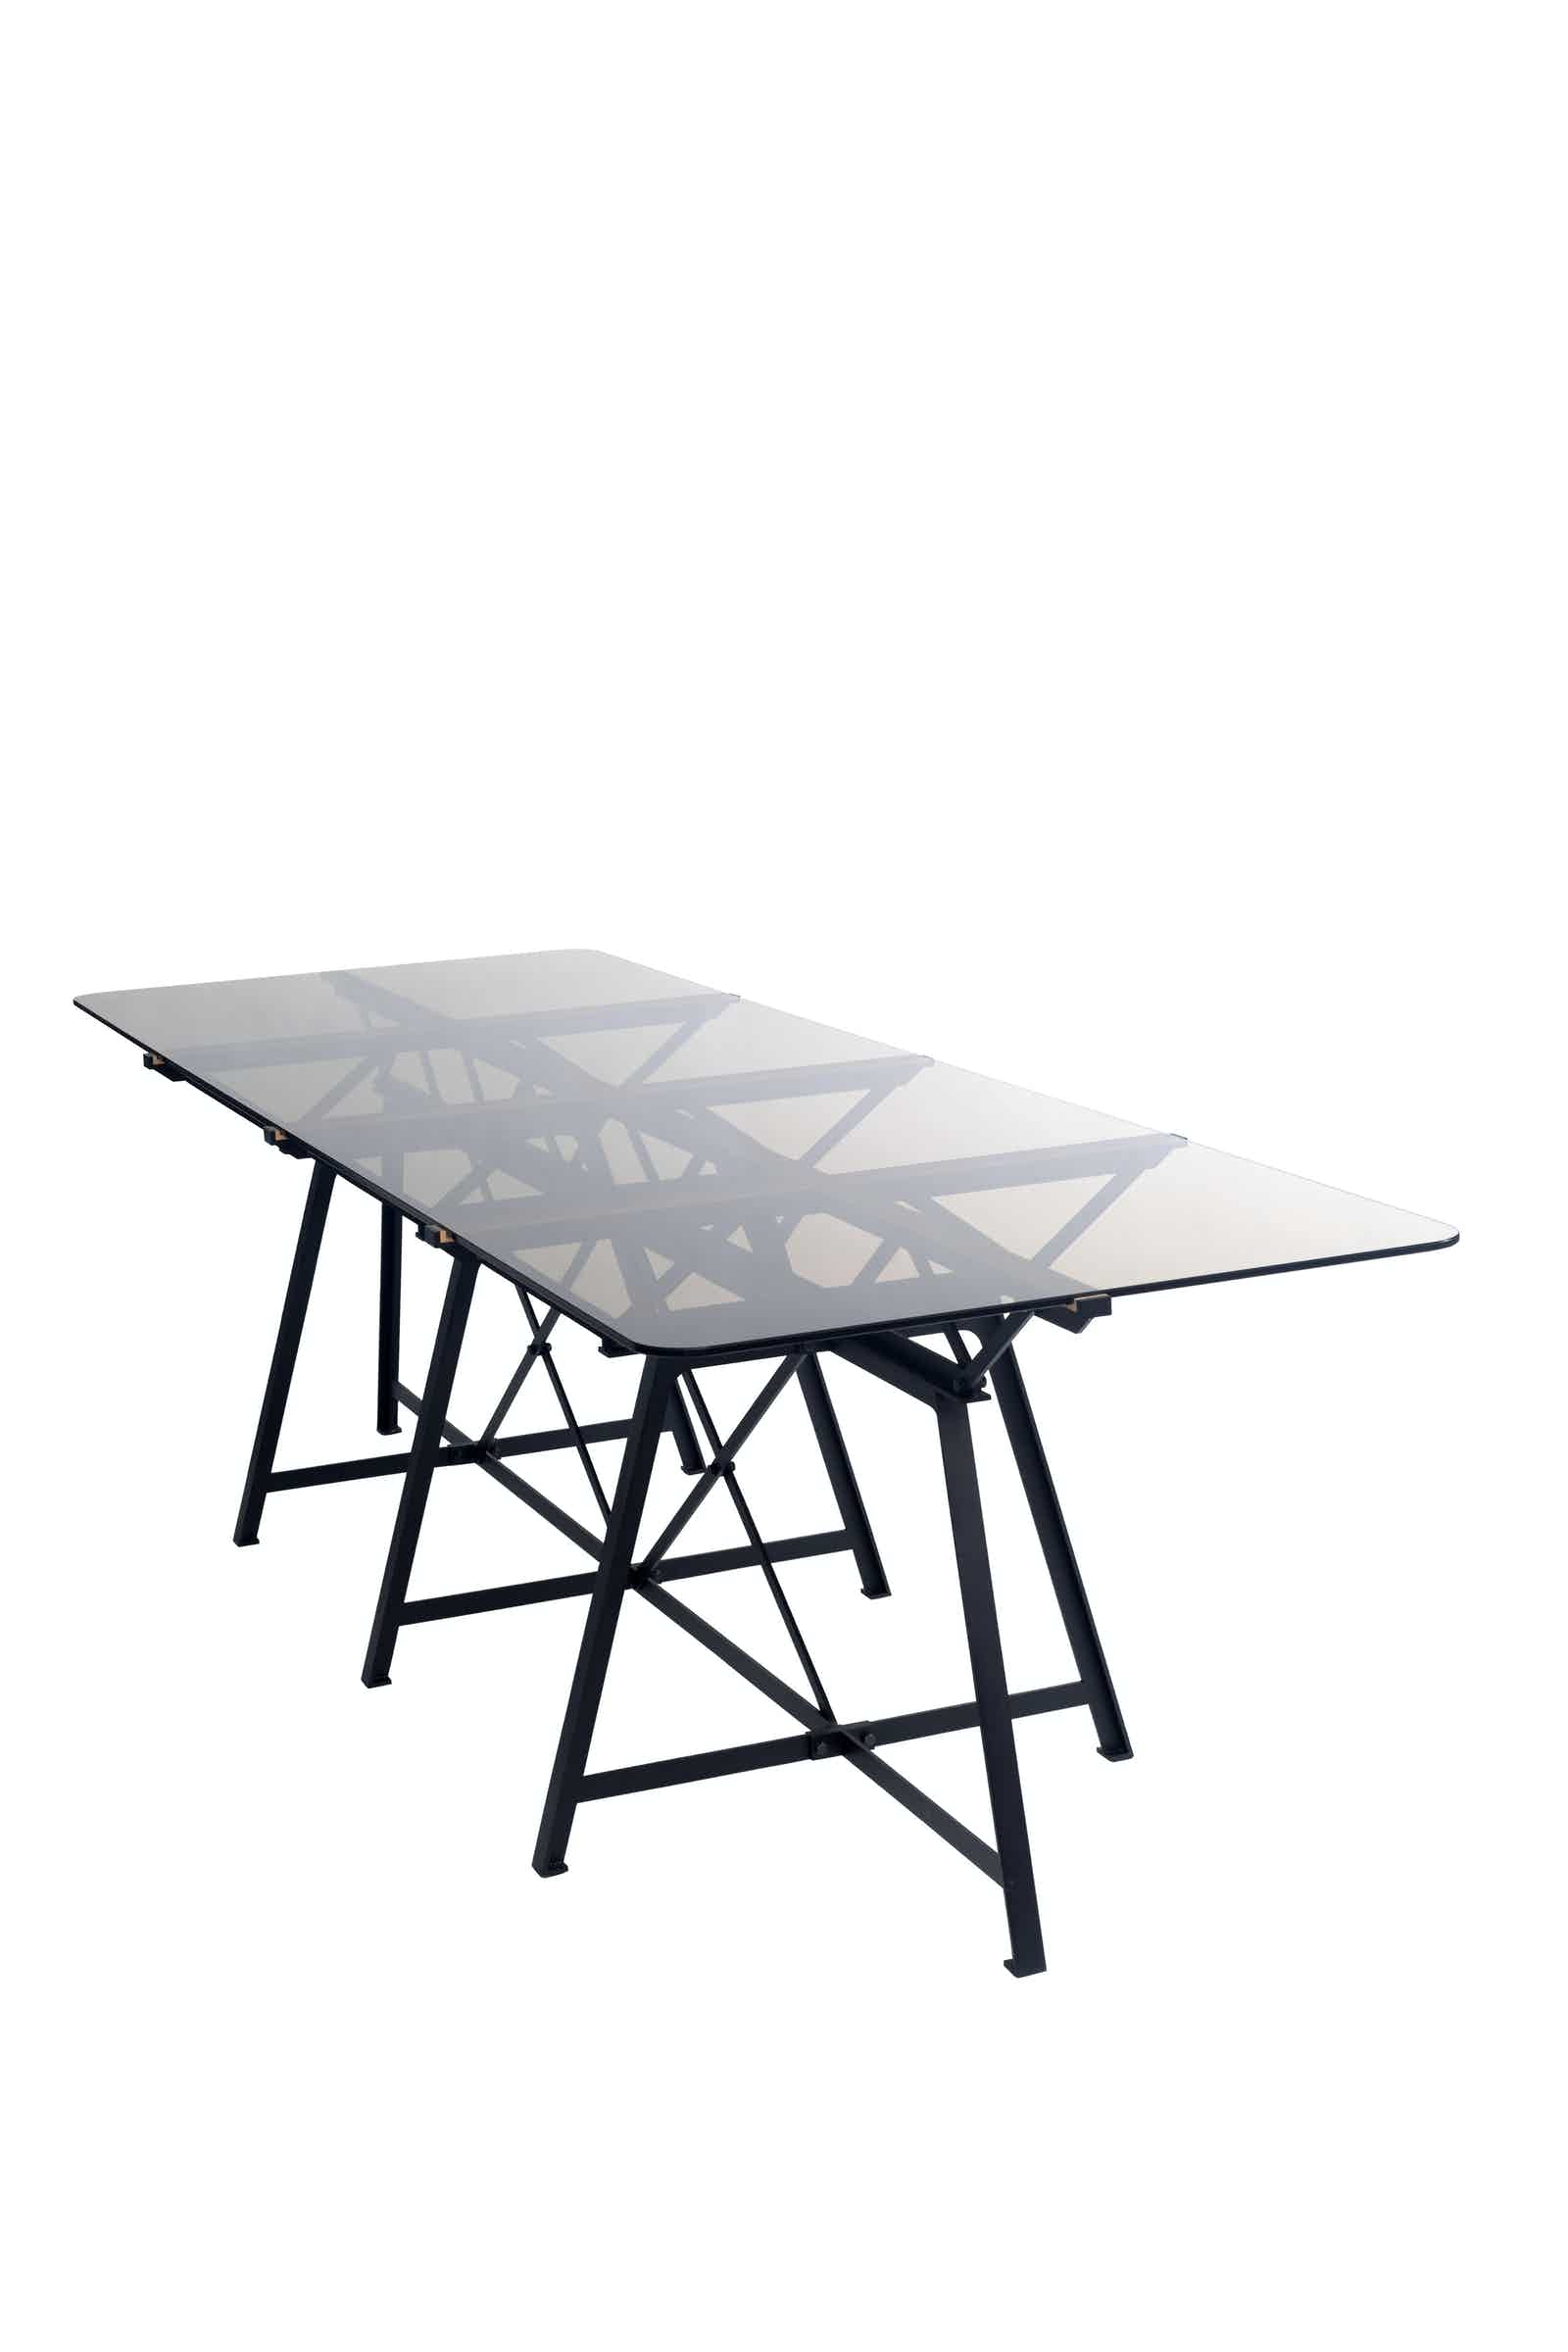 Spectrum Furniture Front Endless Table Haute Living